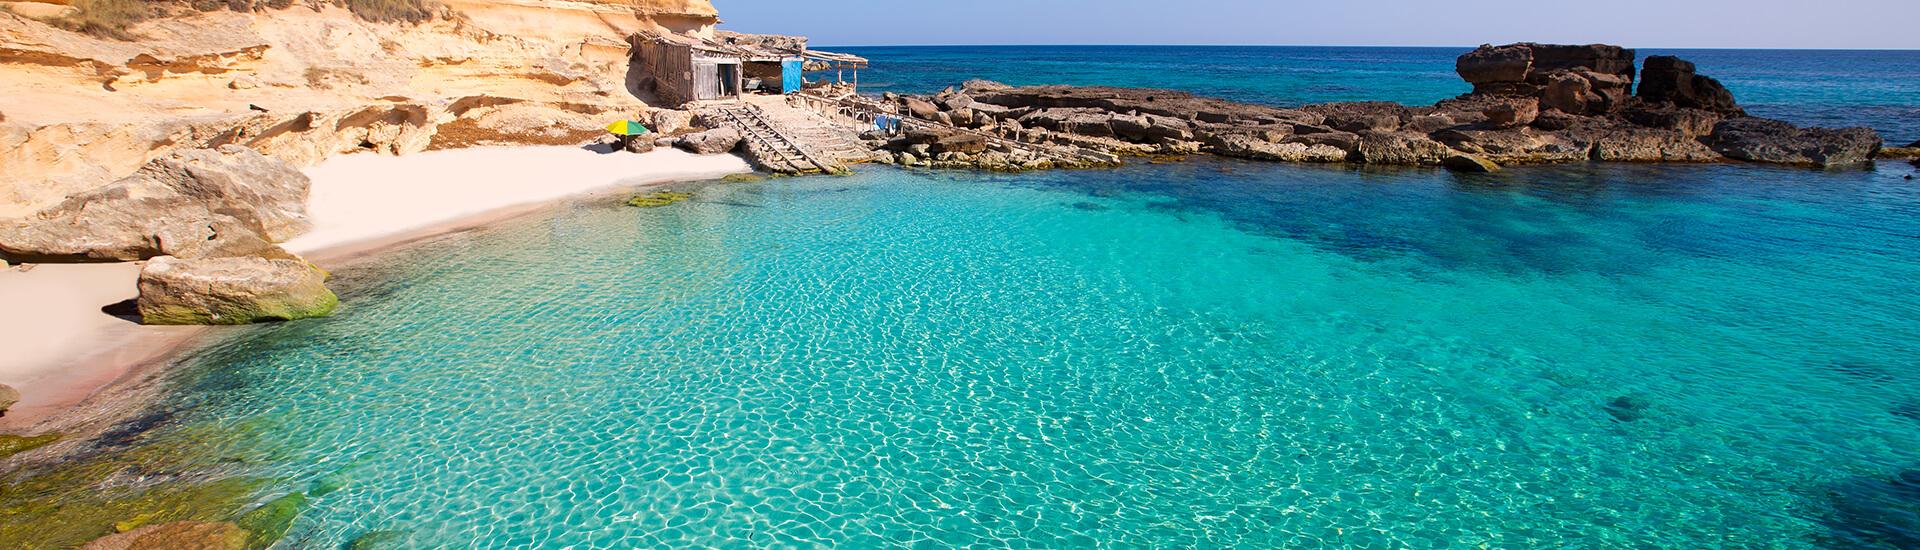 Best 5 beaches of Balearic Islands